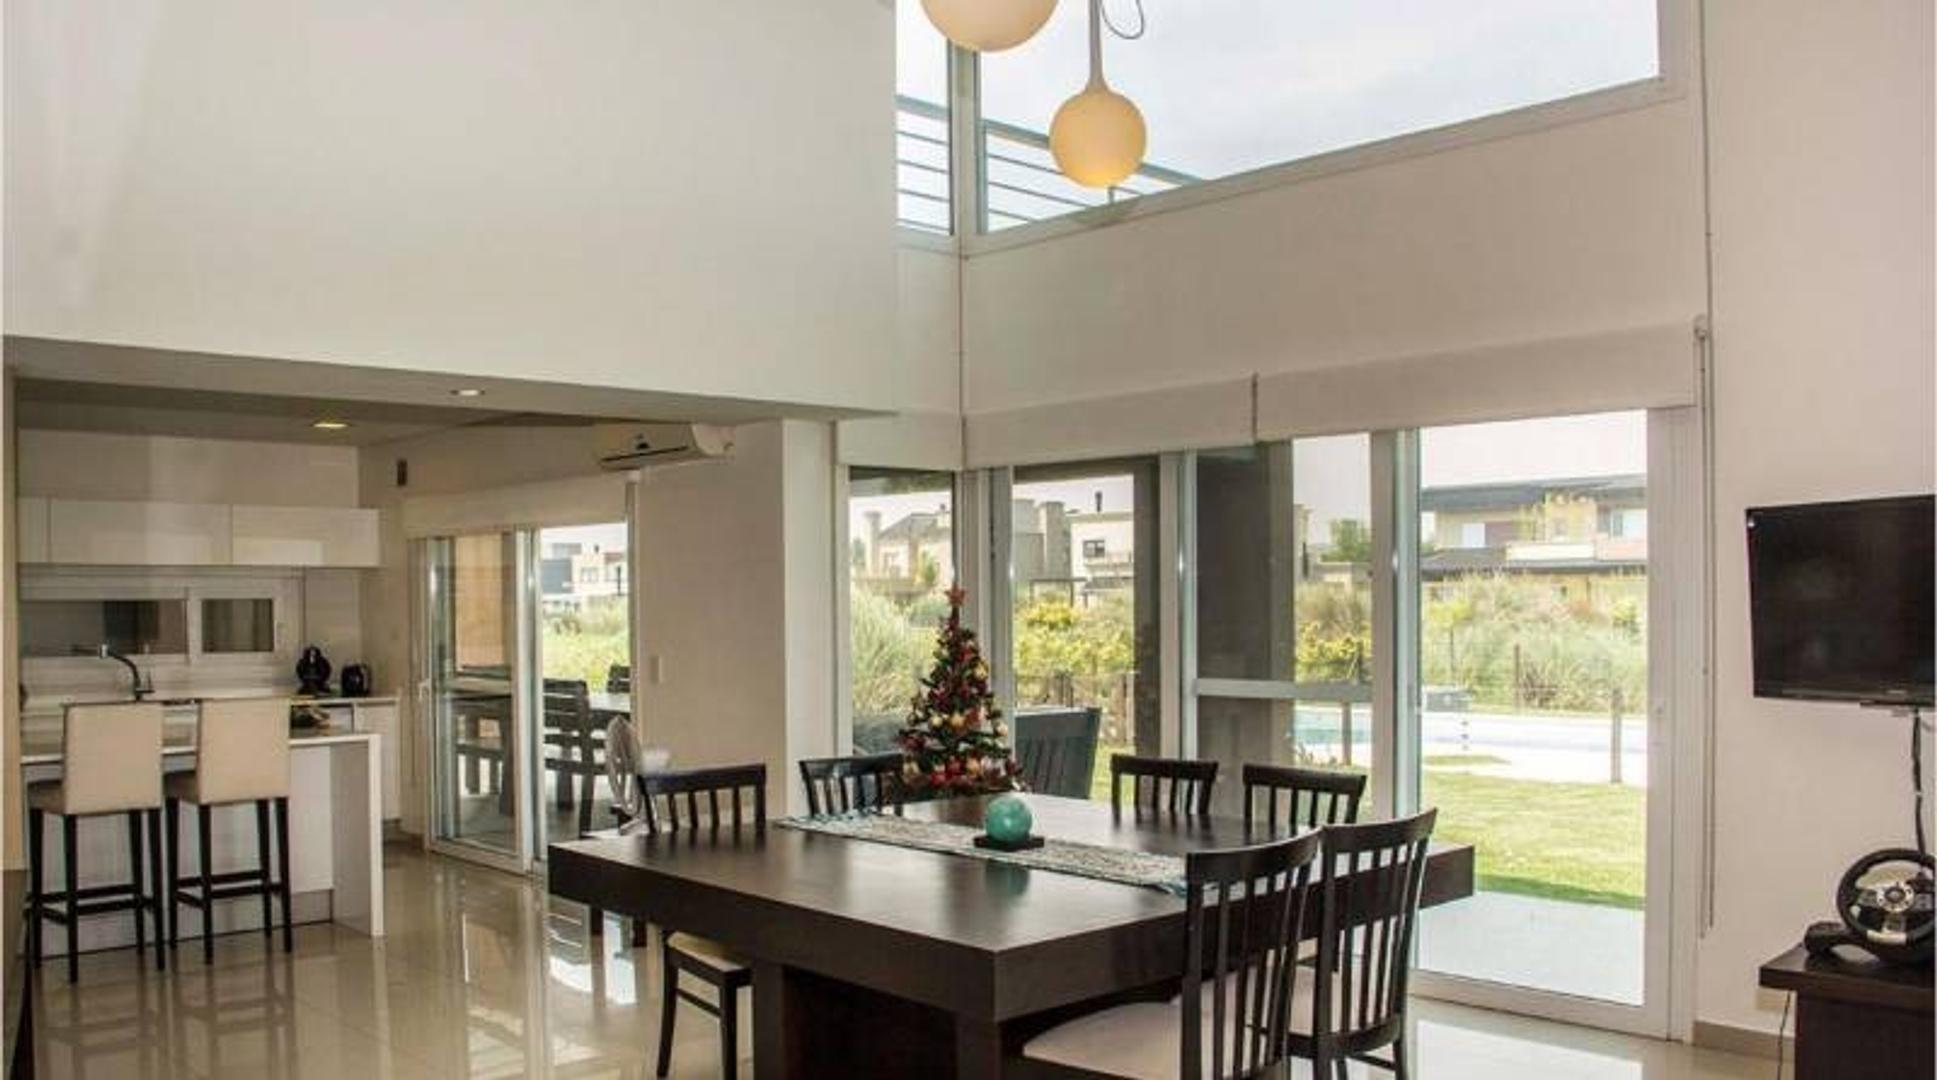 Excelente y moderna casa en Terrravista